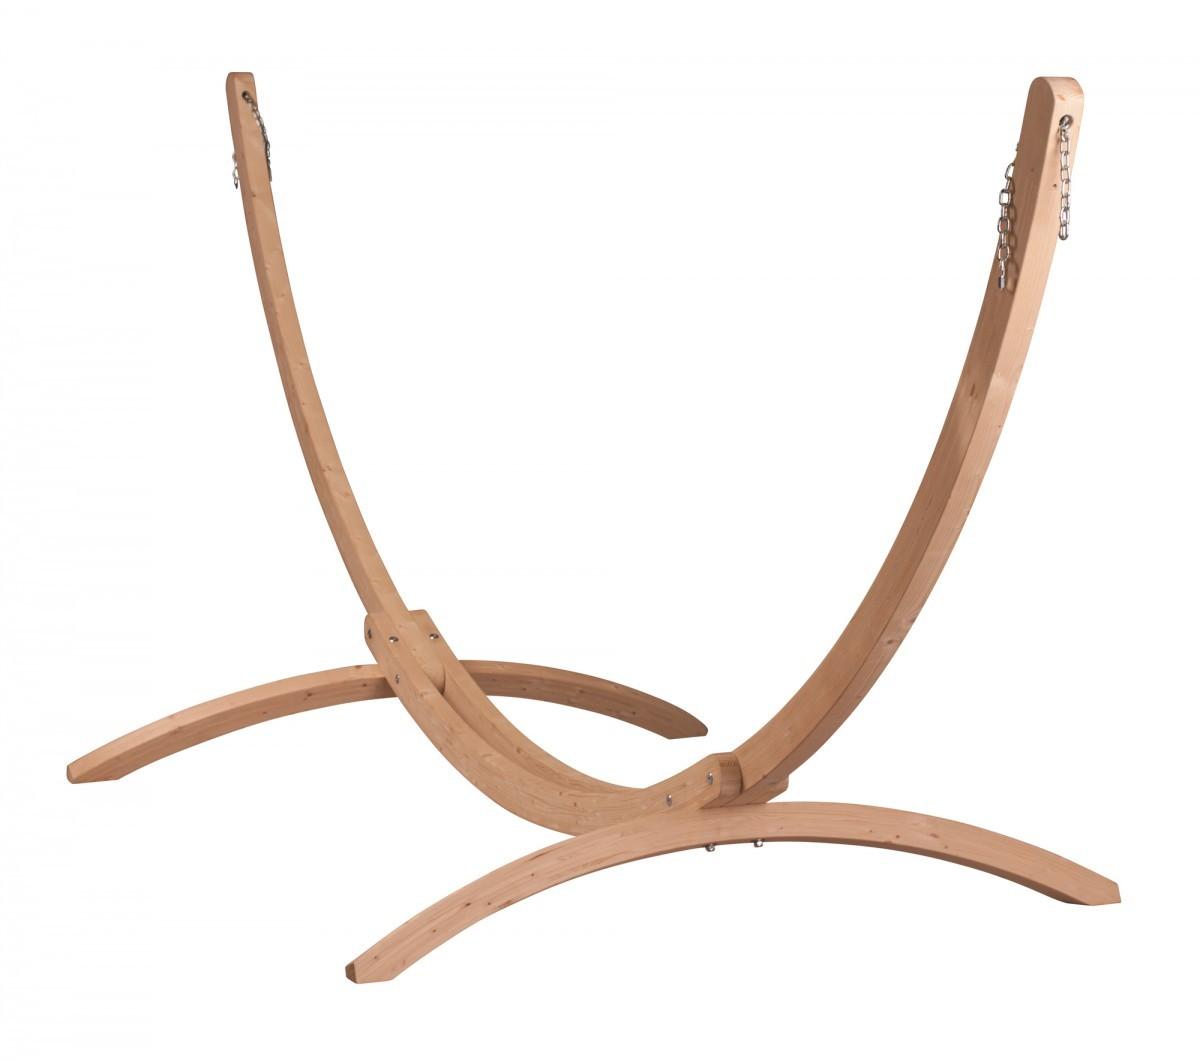 Wood Hammock Stand Kingsize Product Photo